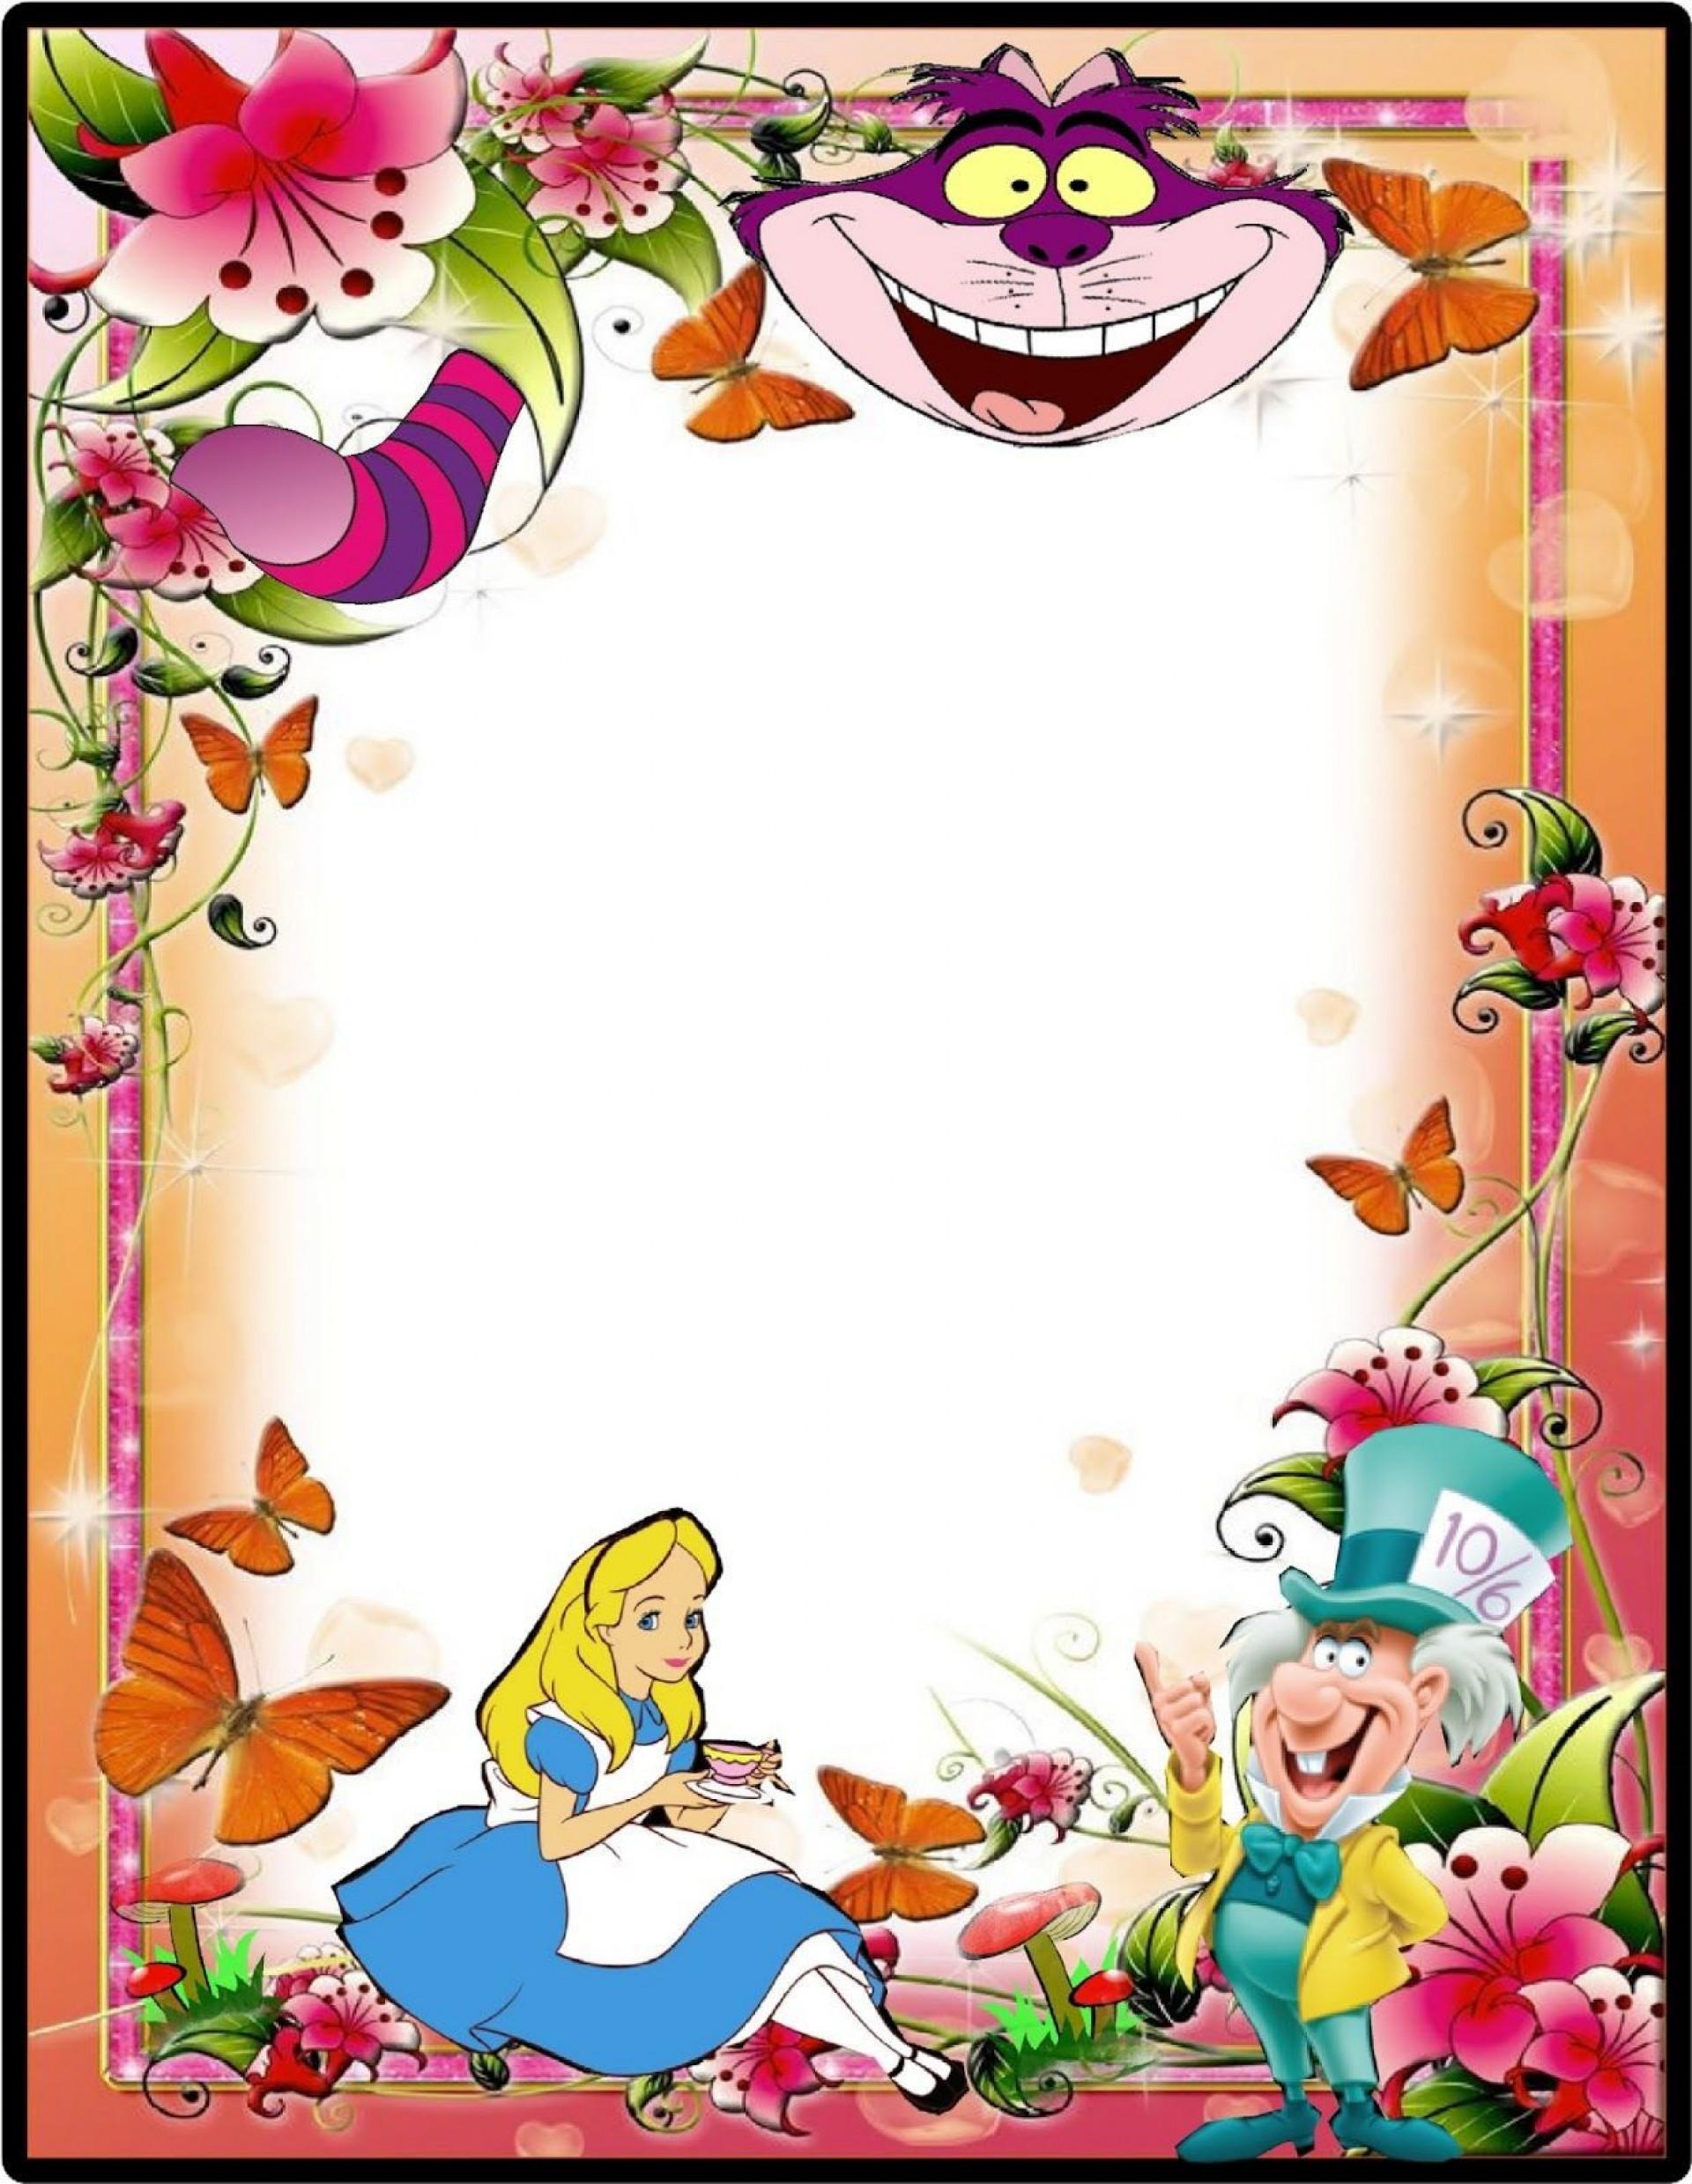 001 Staggering Alice In Wonderland Party Template Idea  Templates Invitation Free1920